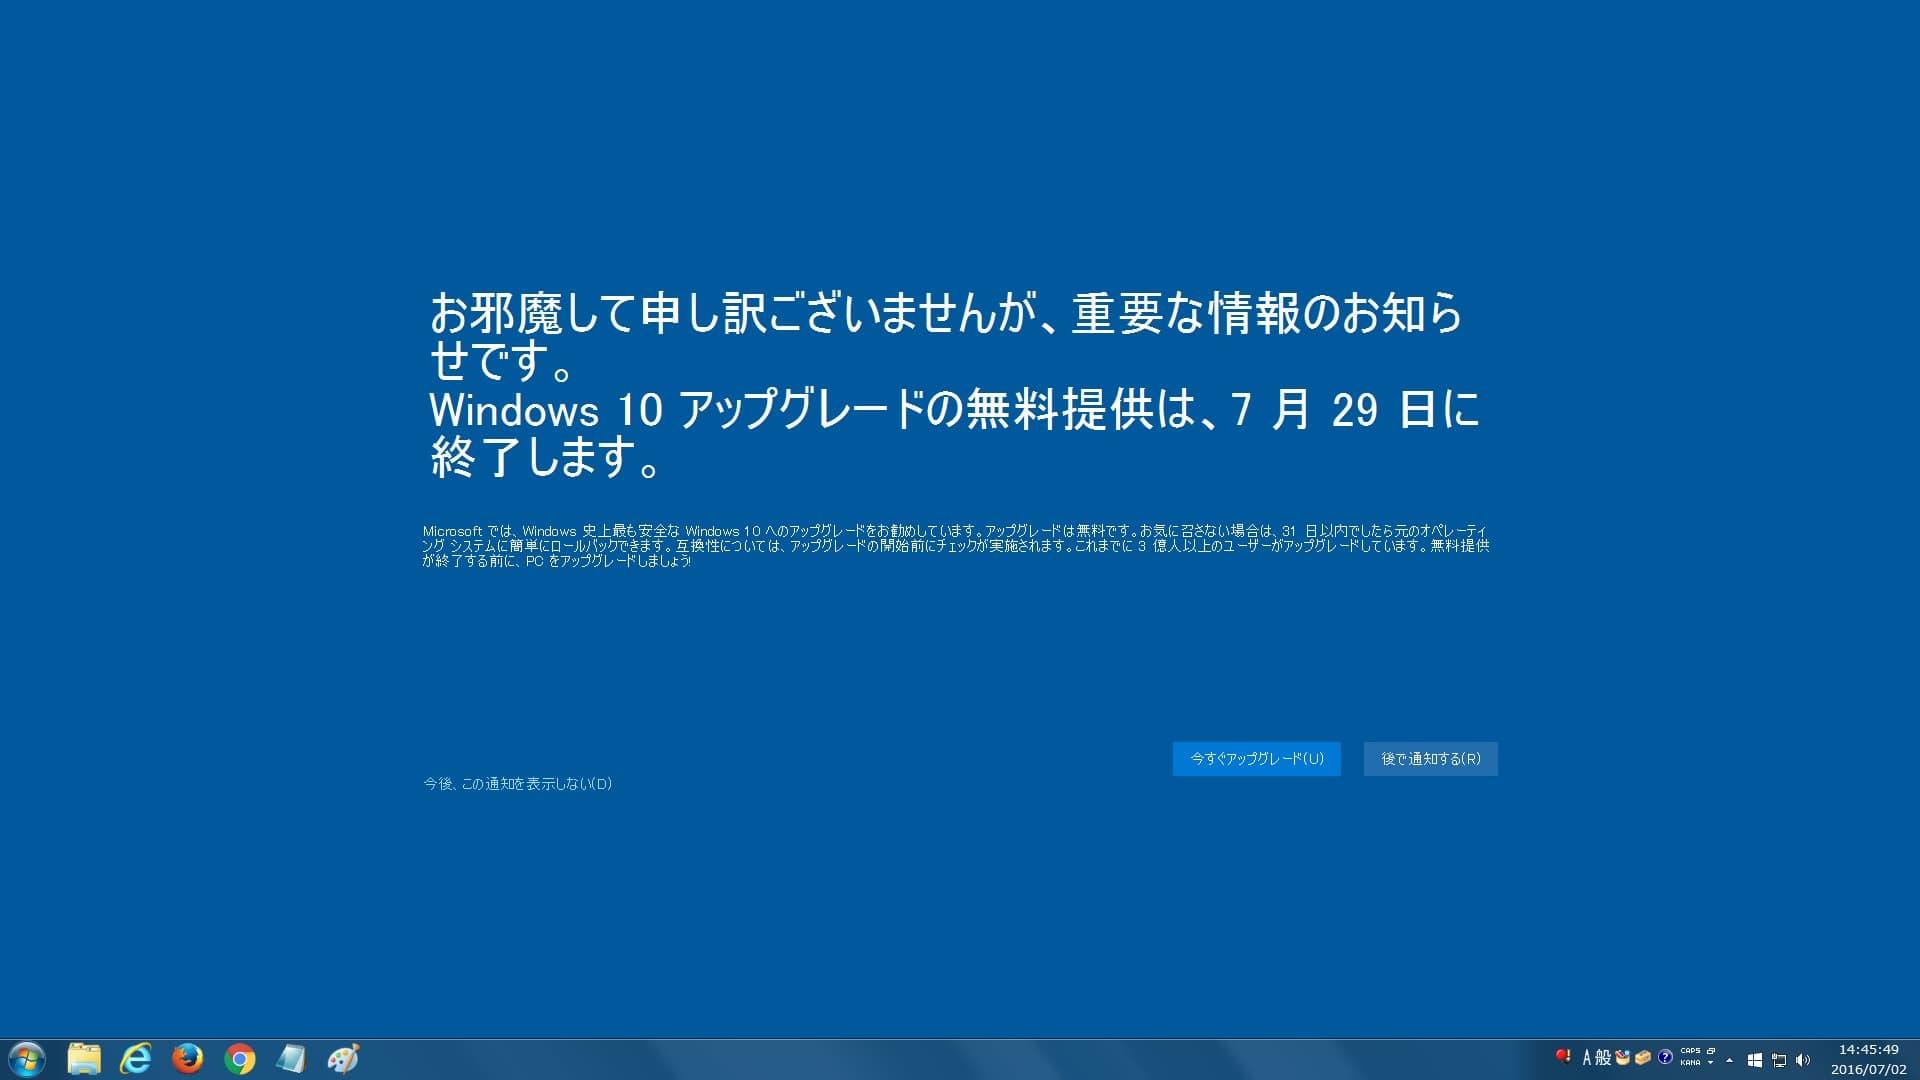 https://art33.photozou.jp/pub/119/2912119/photo/238324346_org.v1467439622.jpg